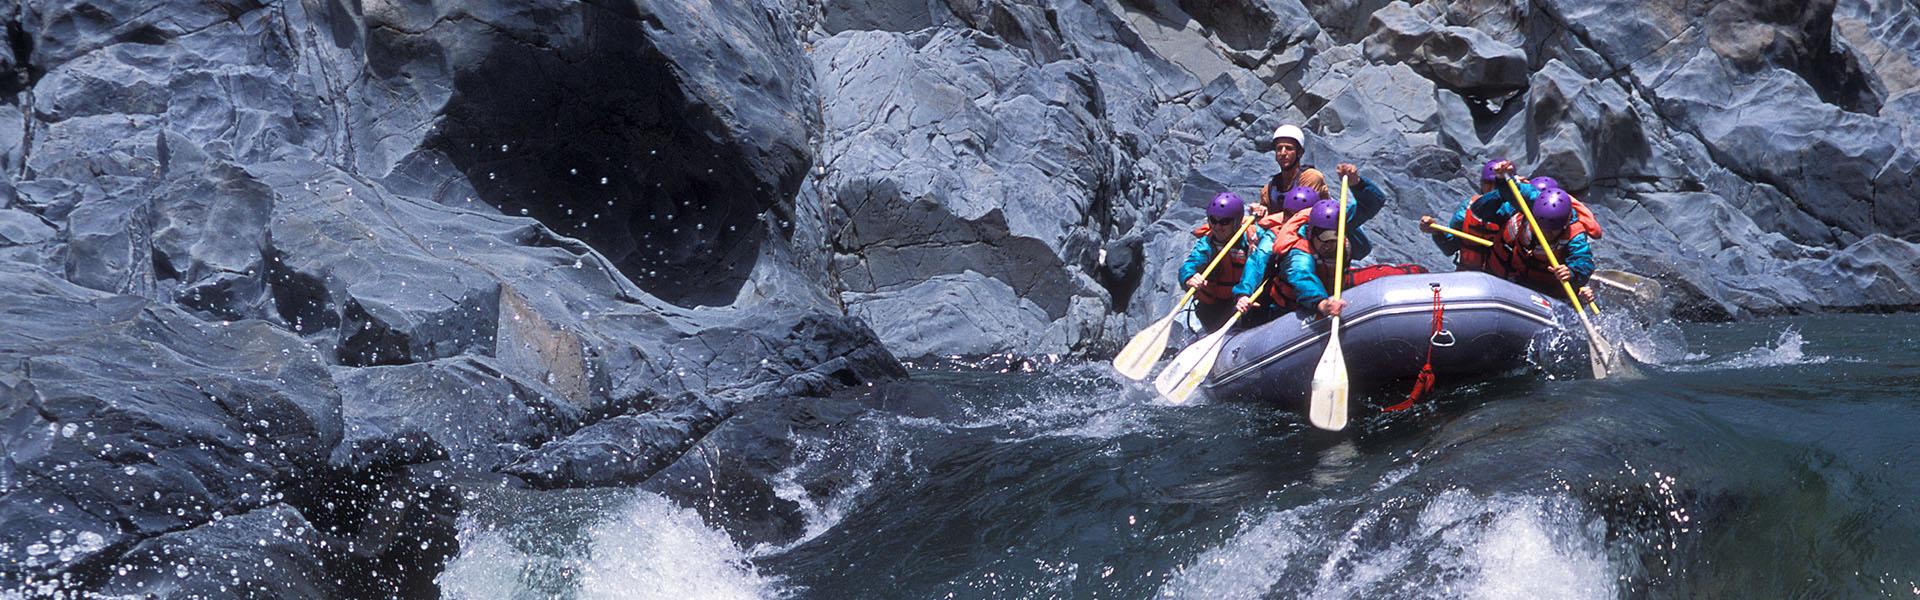 North Fork American River - Whitewater Rafting (Intermediate